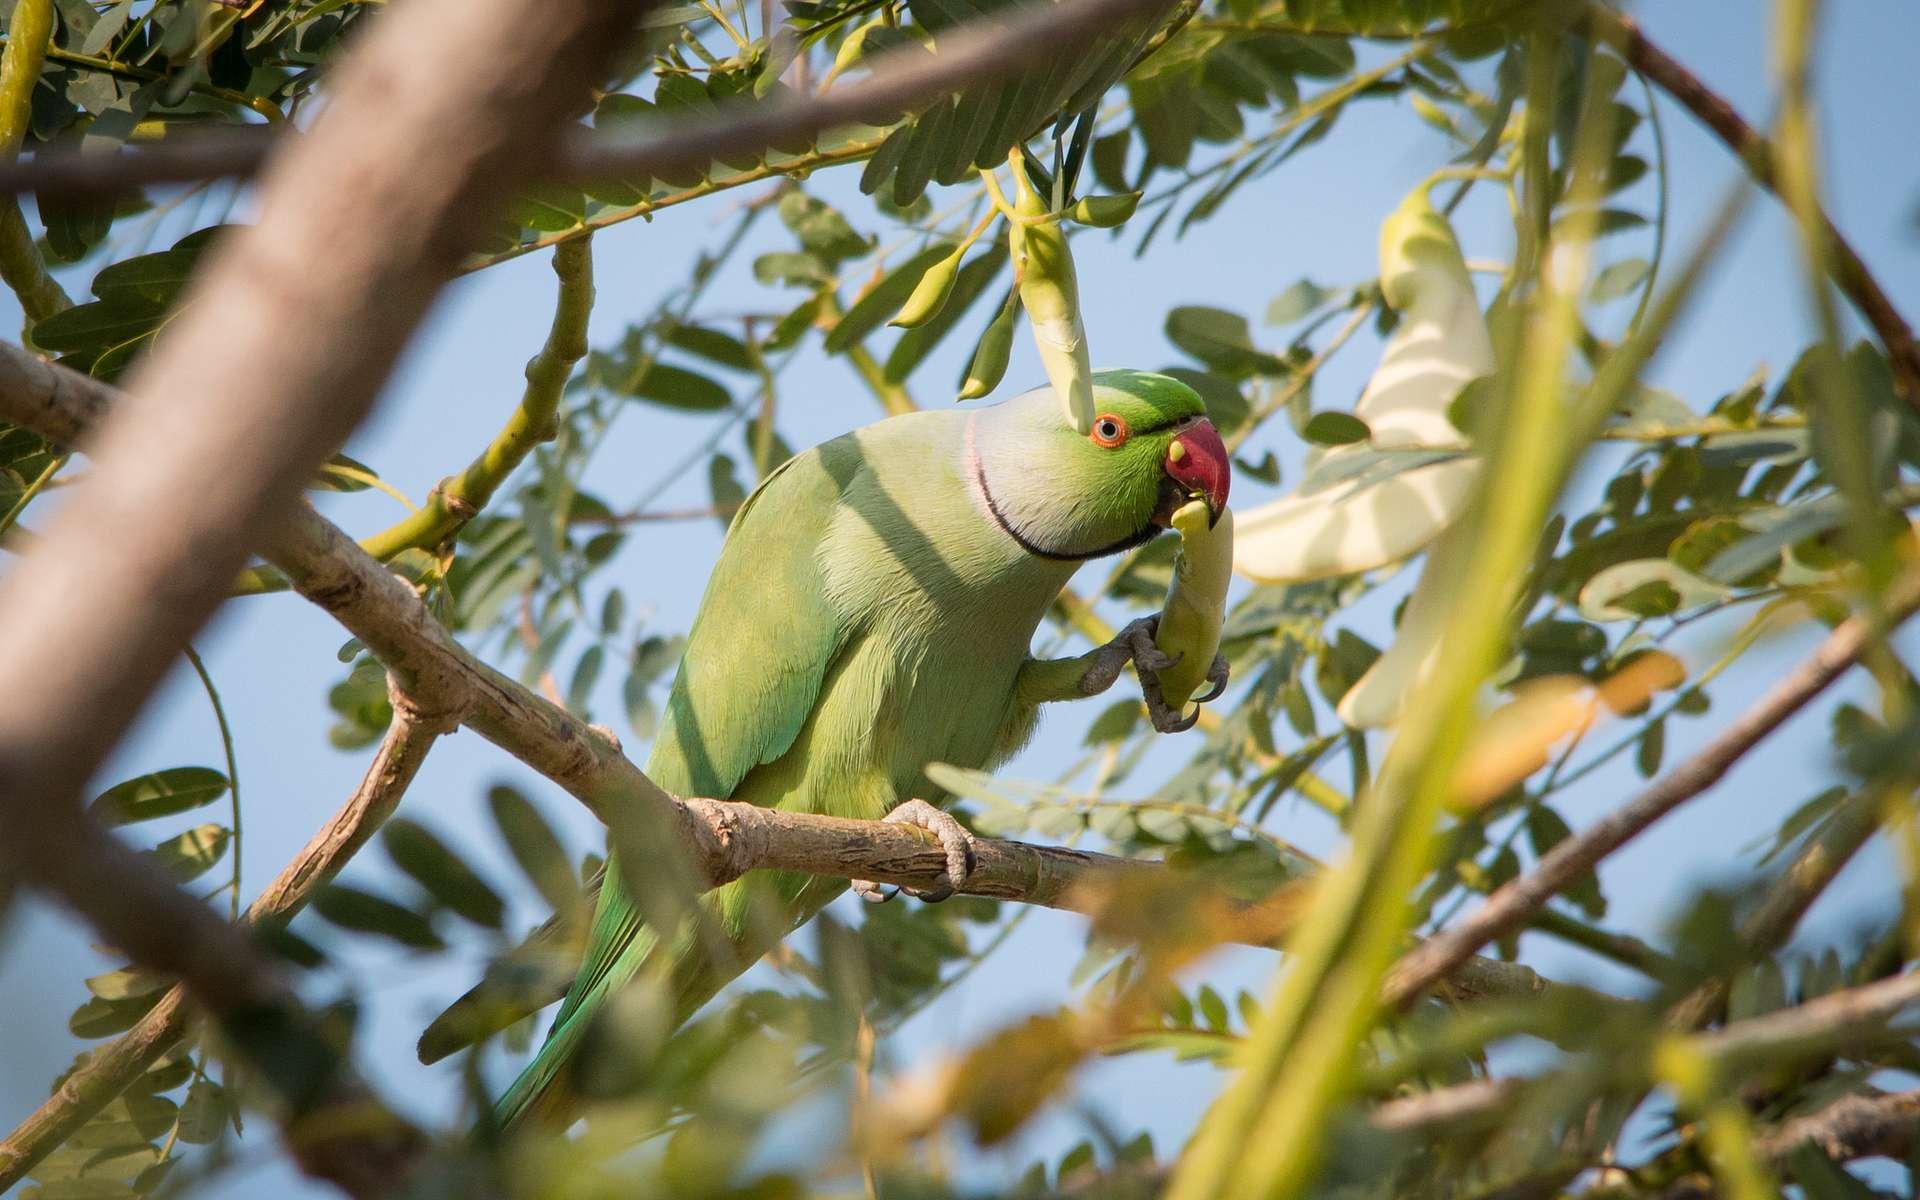 Les perroquets aussi se droguent à l'opium. © Peter Steward, Flickr